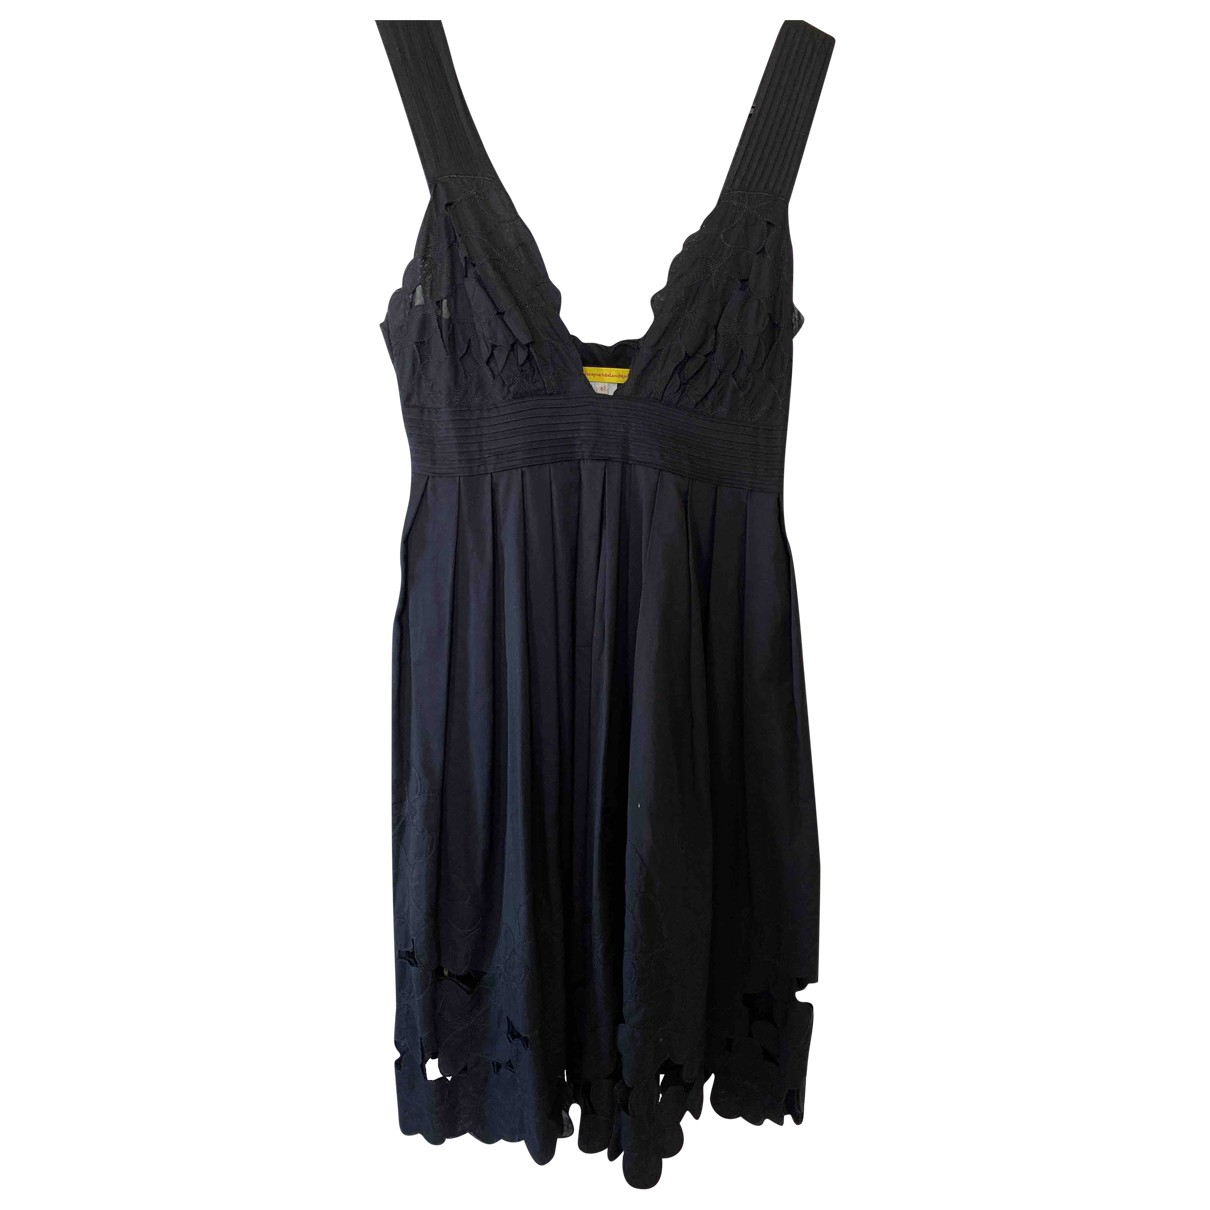 Catherine Malandrino N Black Cotton dress for Women 10 UK